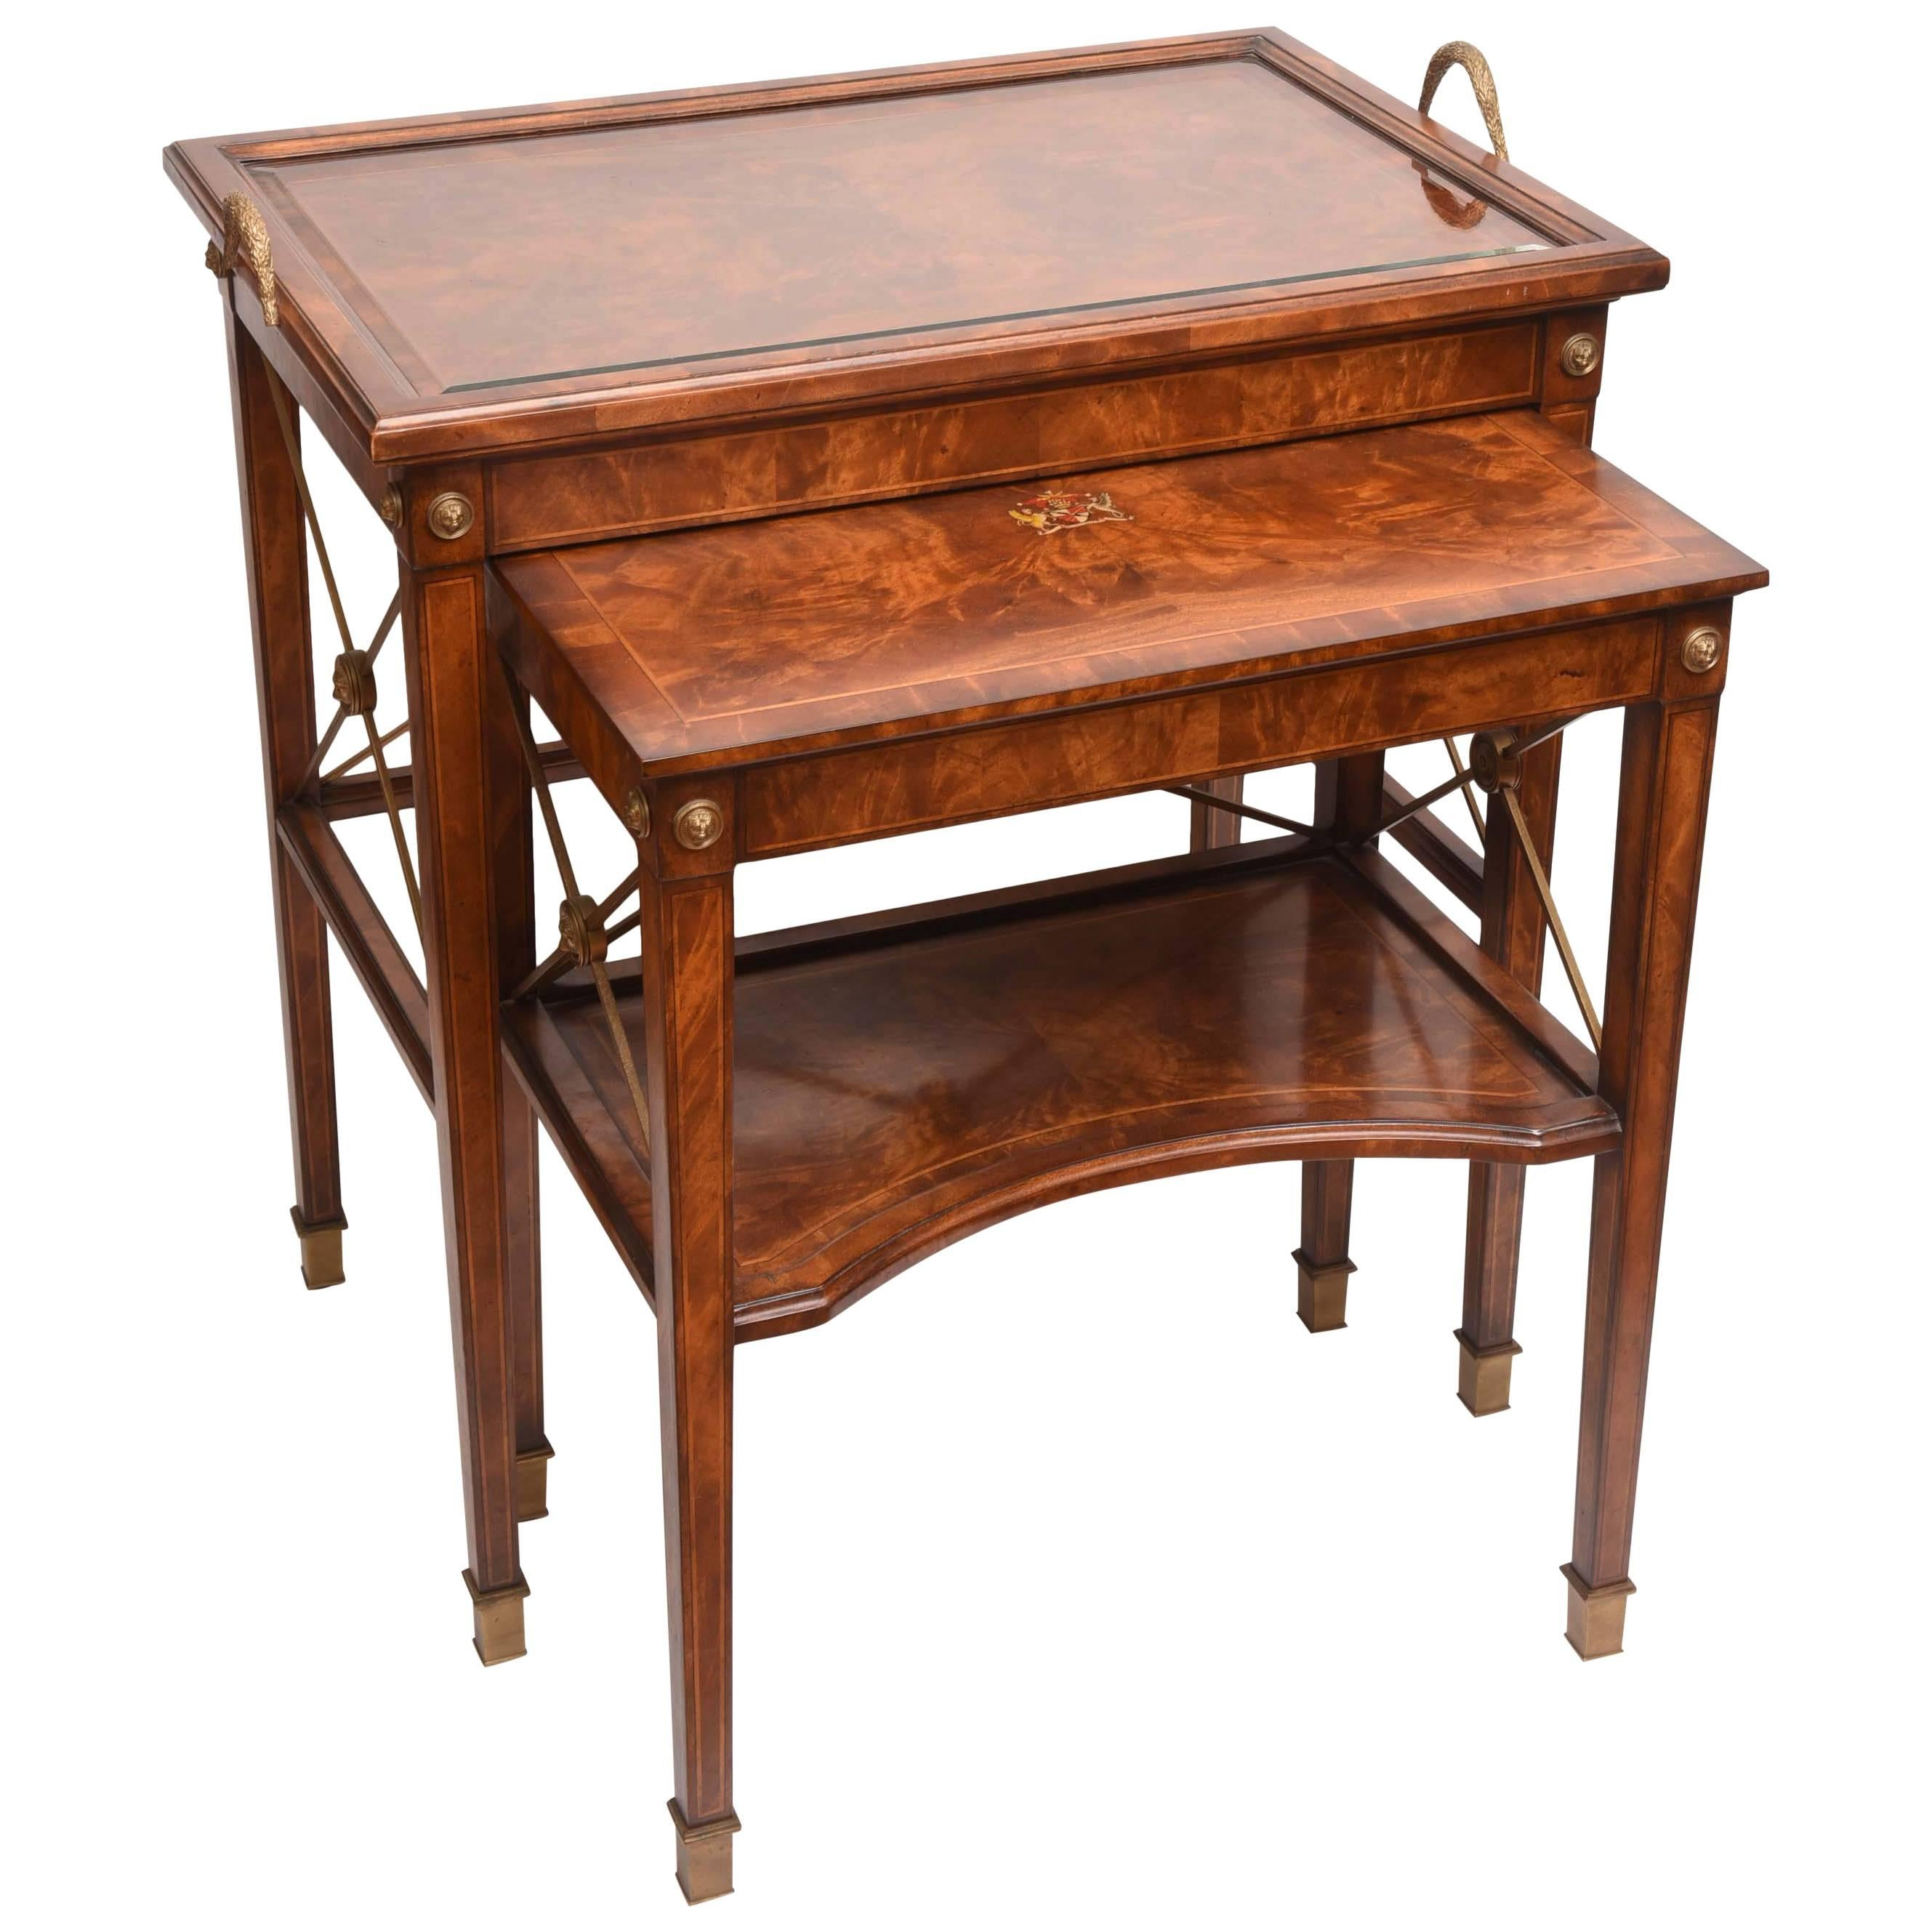 English Armorial Manor House Nesting Table